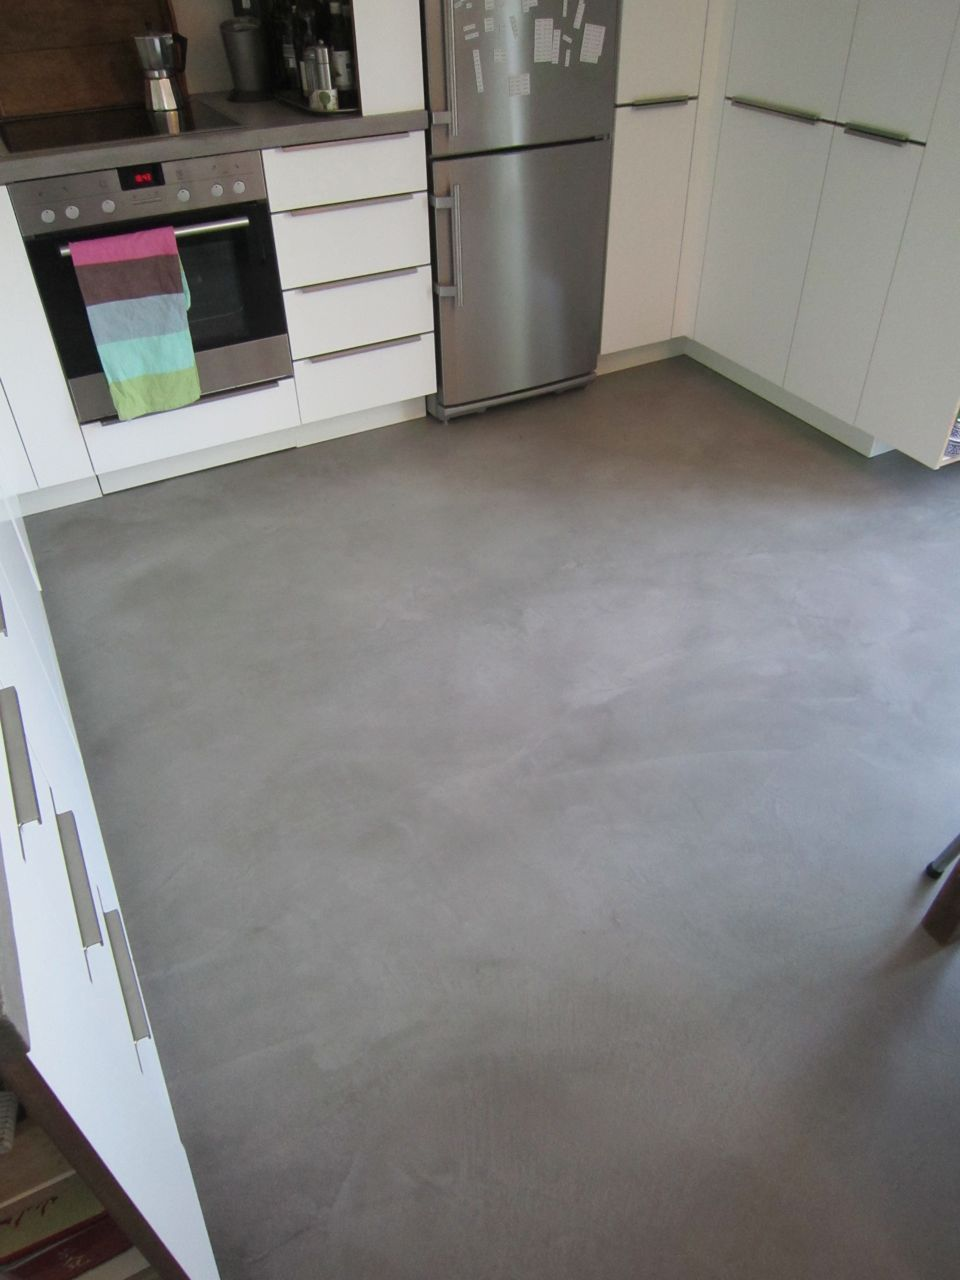 Full Size of Bodenbelag Gastroküche Bodenbelag Küche Fliesen Boden Küche Gießen Kautschuk Bodenbelag Küche Küche Bodenbelag Küche